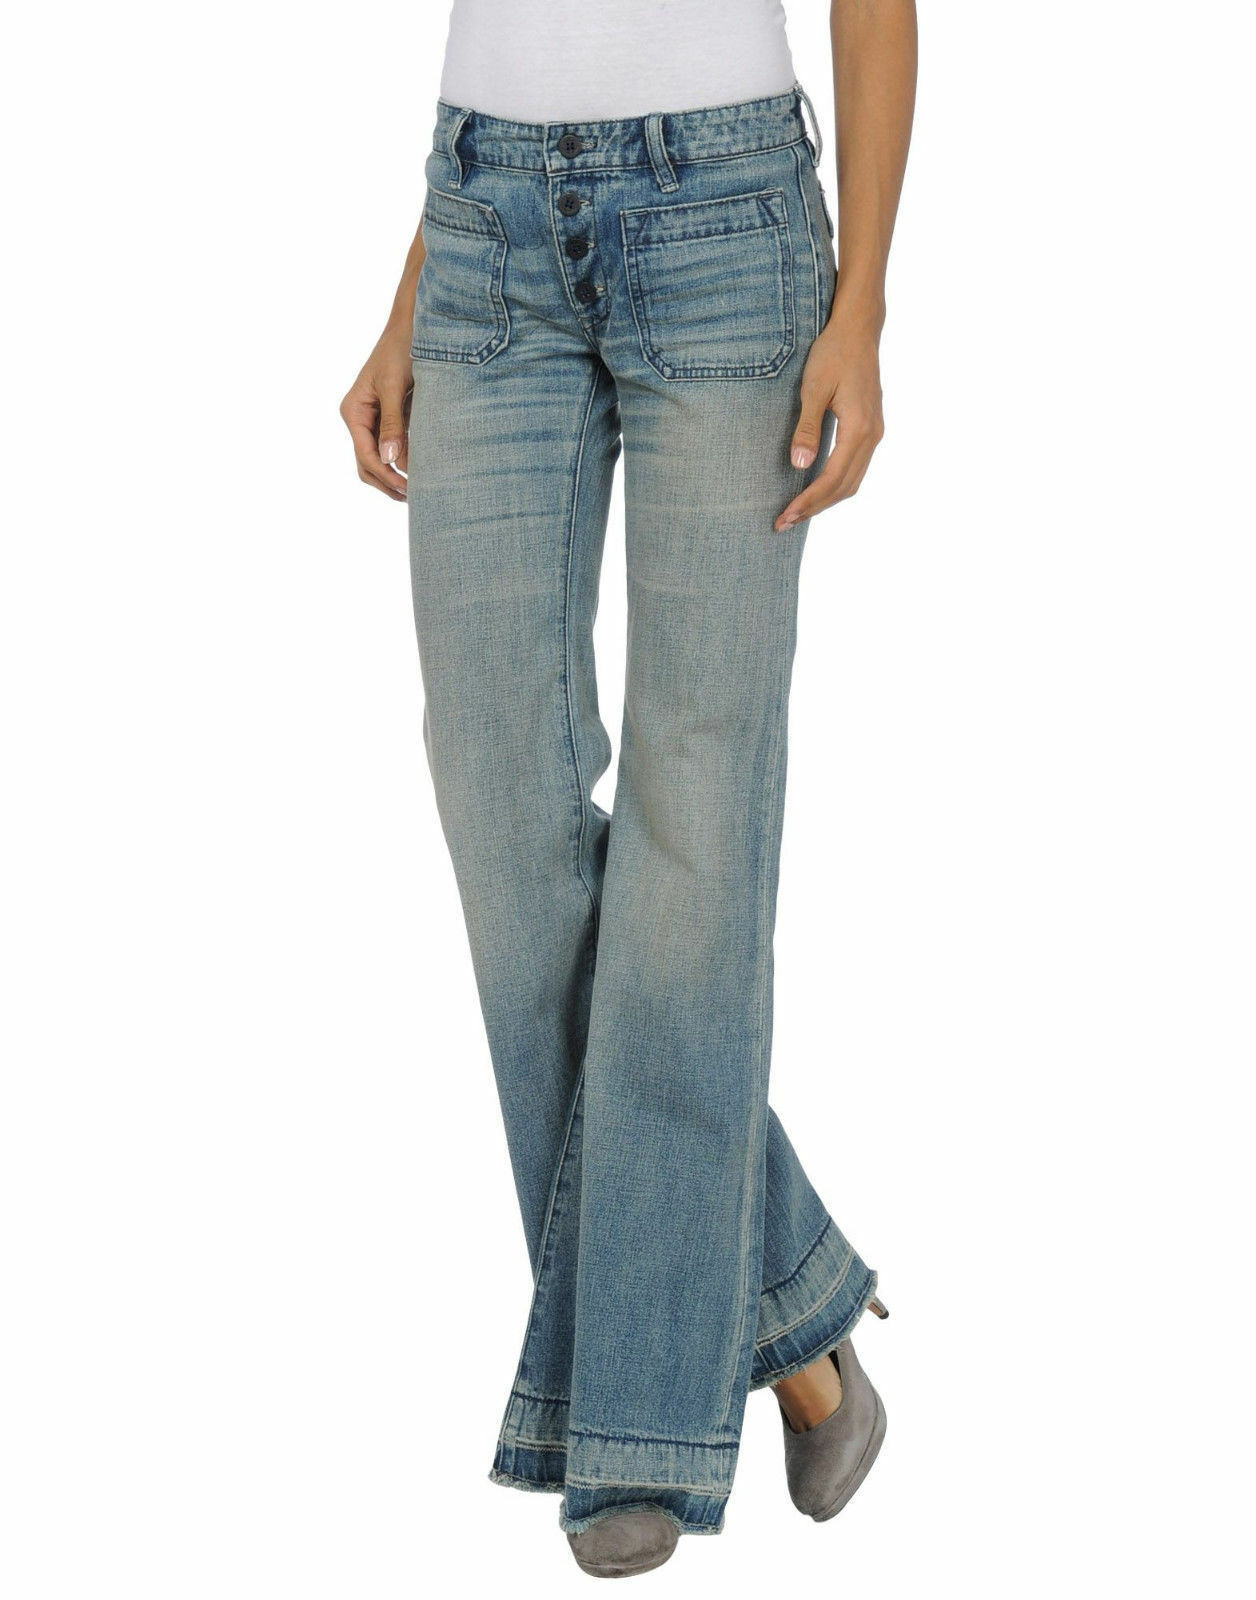 Denim & Supply Ralph Lauren Jeans Flare Button Fly Released Hem  28 x 34